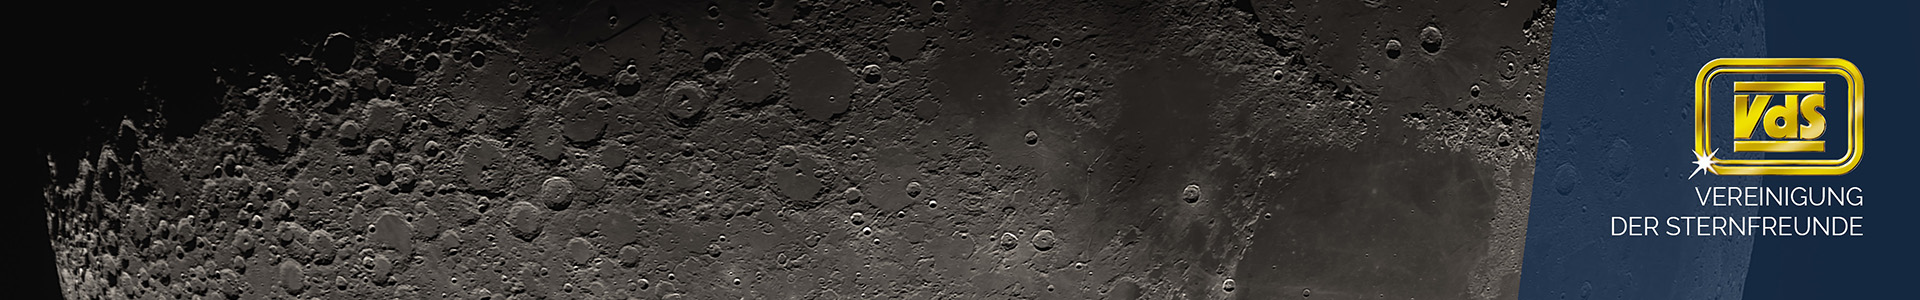 Astronomietag 20.03.2021